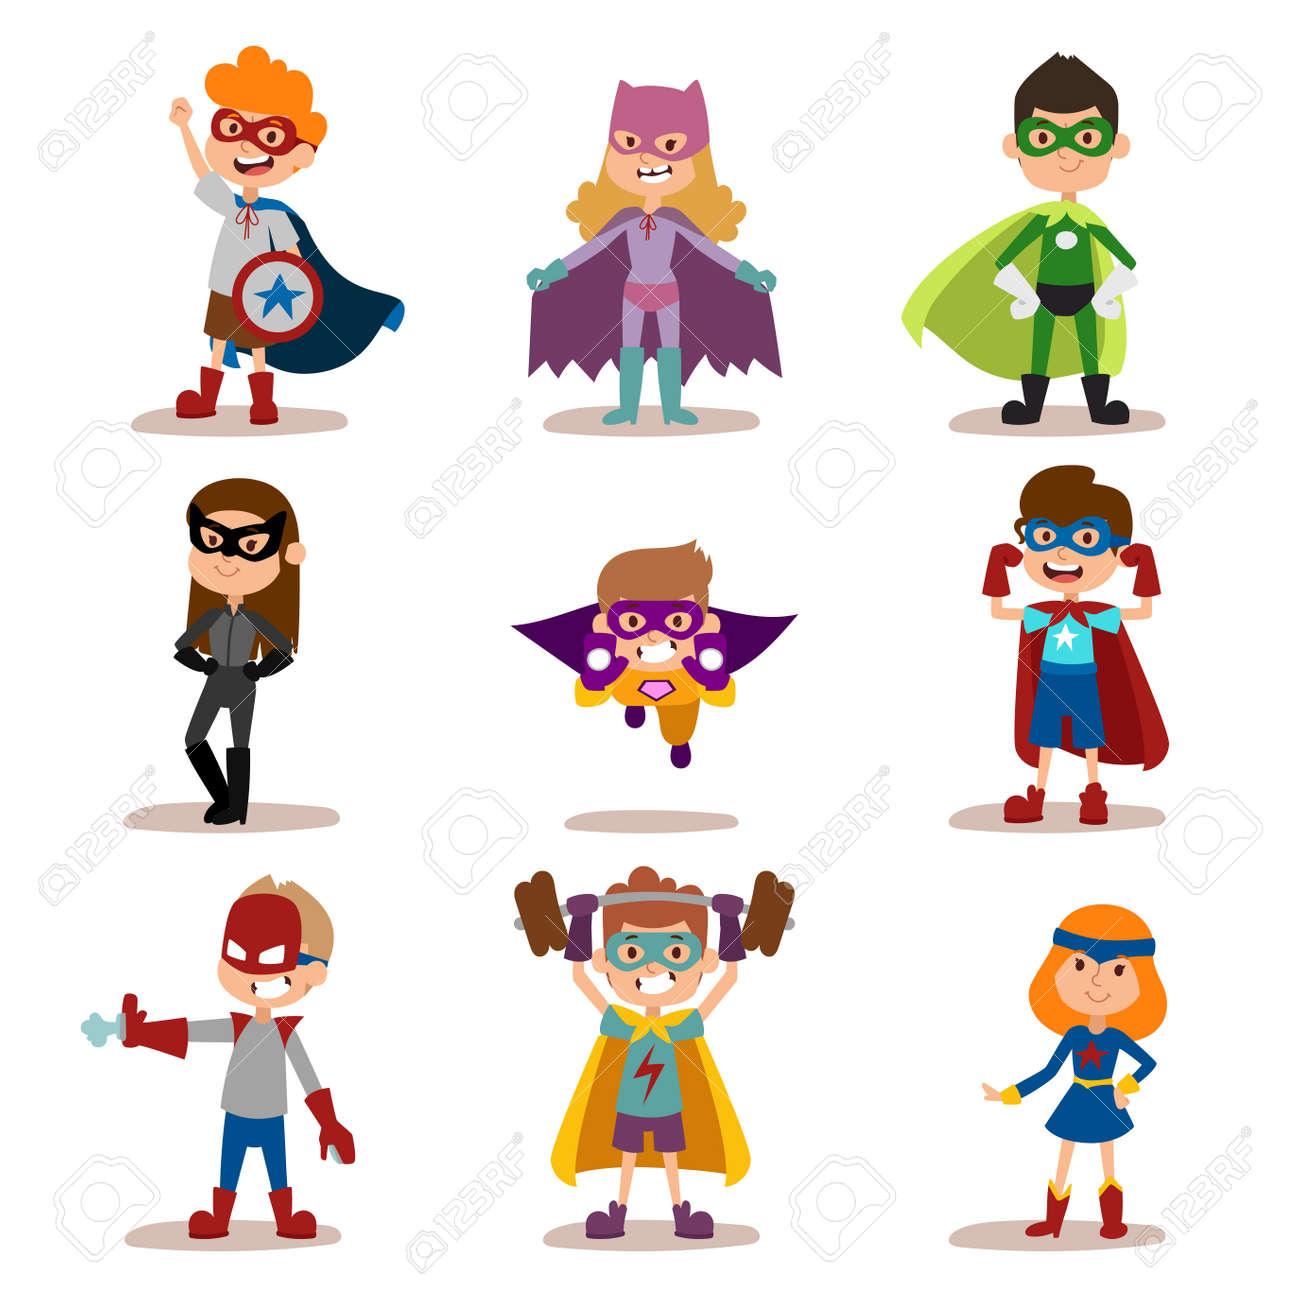 Superhero kids boys and girls cartoon vector illustration. Super children illustration. Super hero kids playing, fly, Super kids in action. Superkids flying, success people concept - 50132880